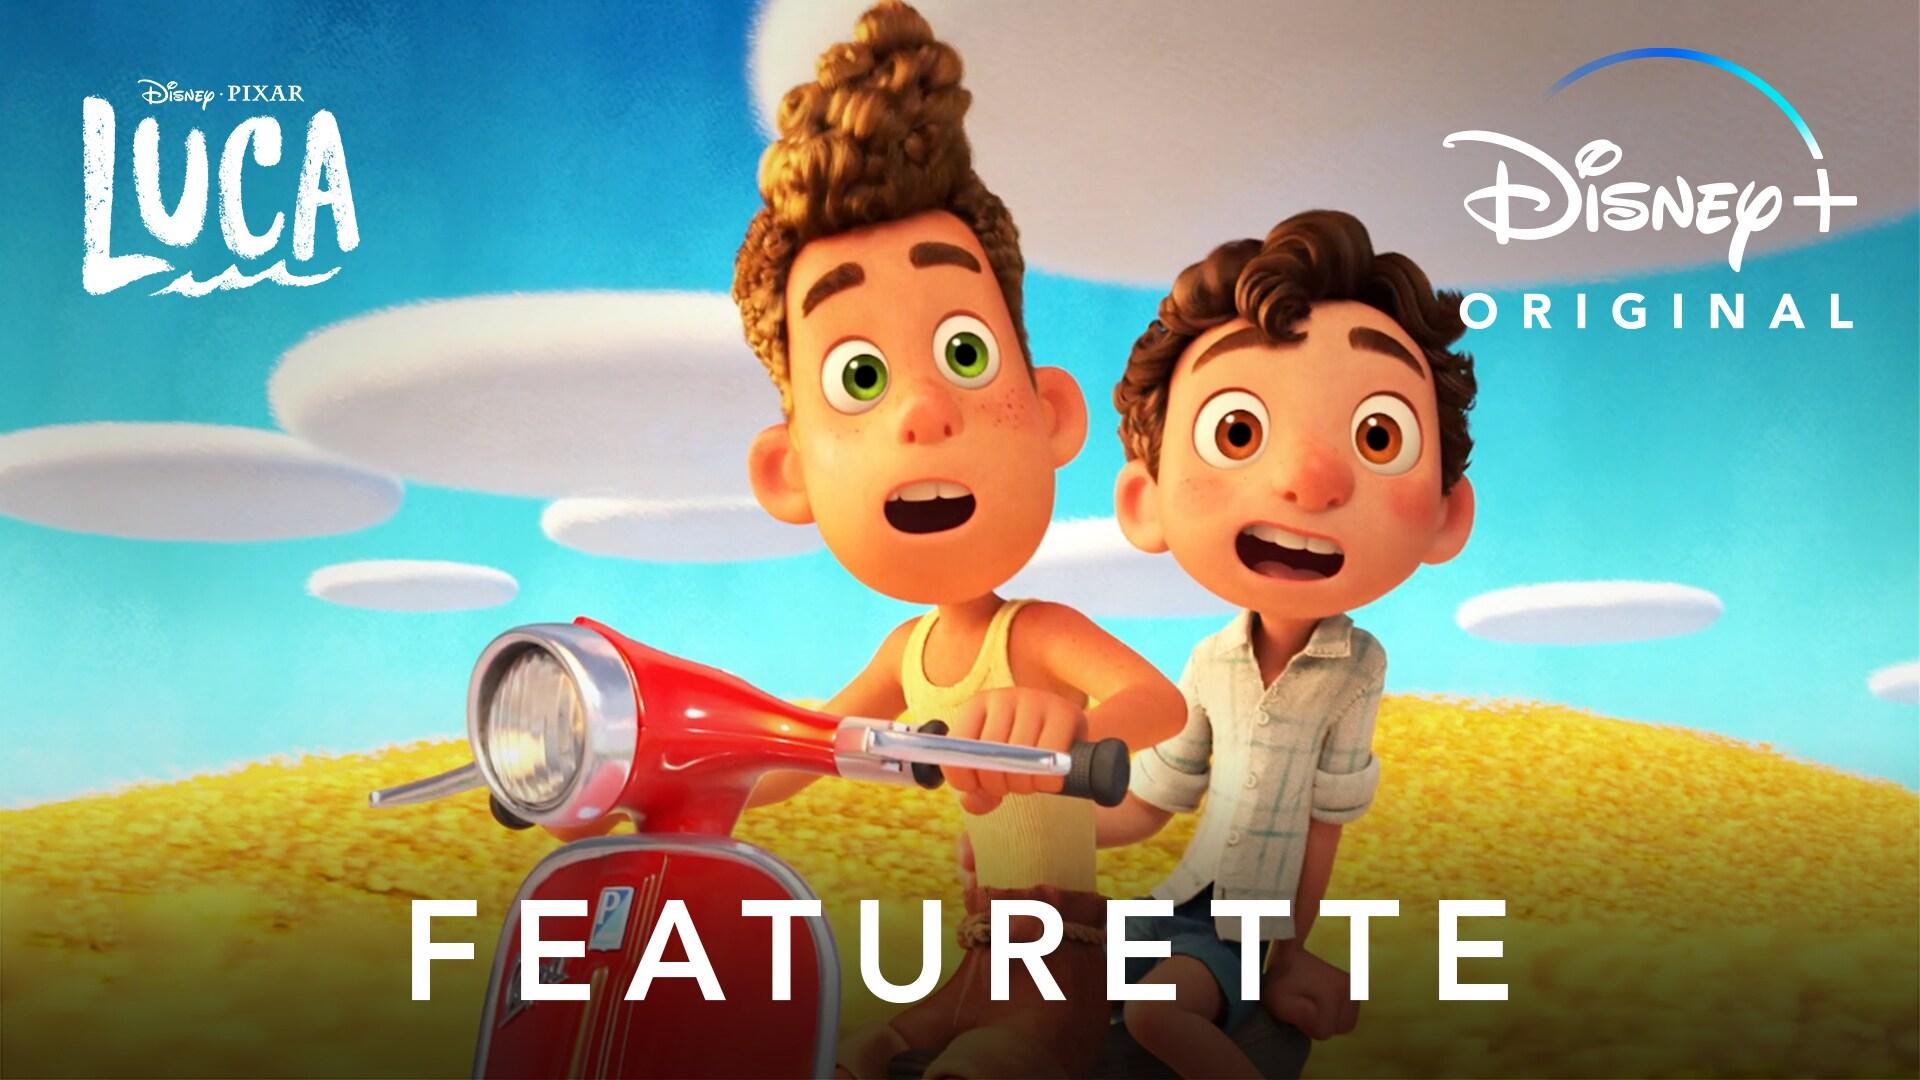 Evolution of a World | Disney and Pixar's Luca | Disney+